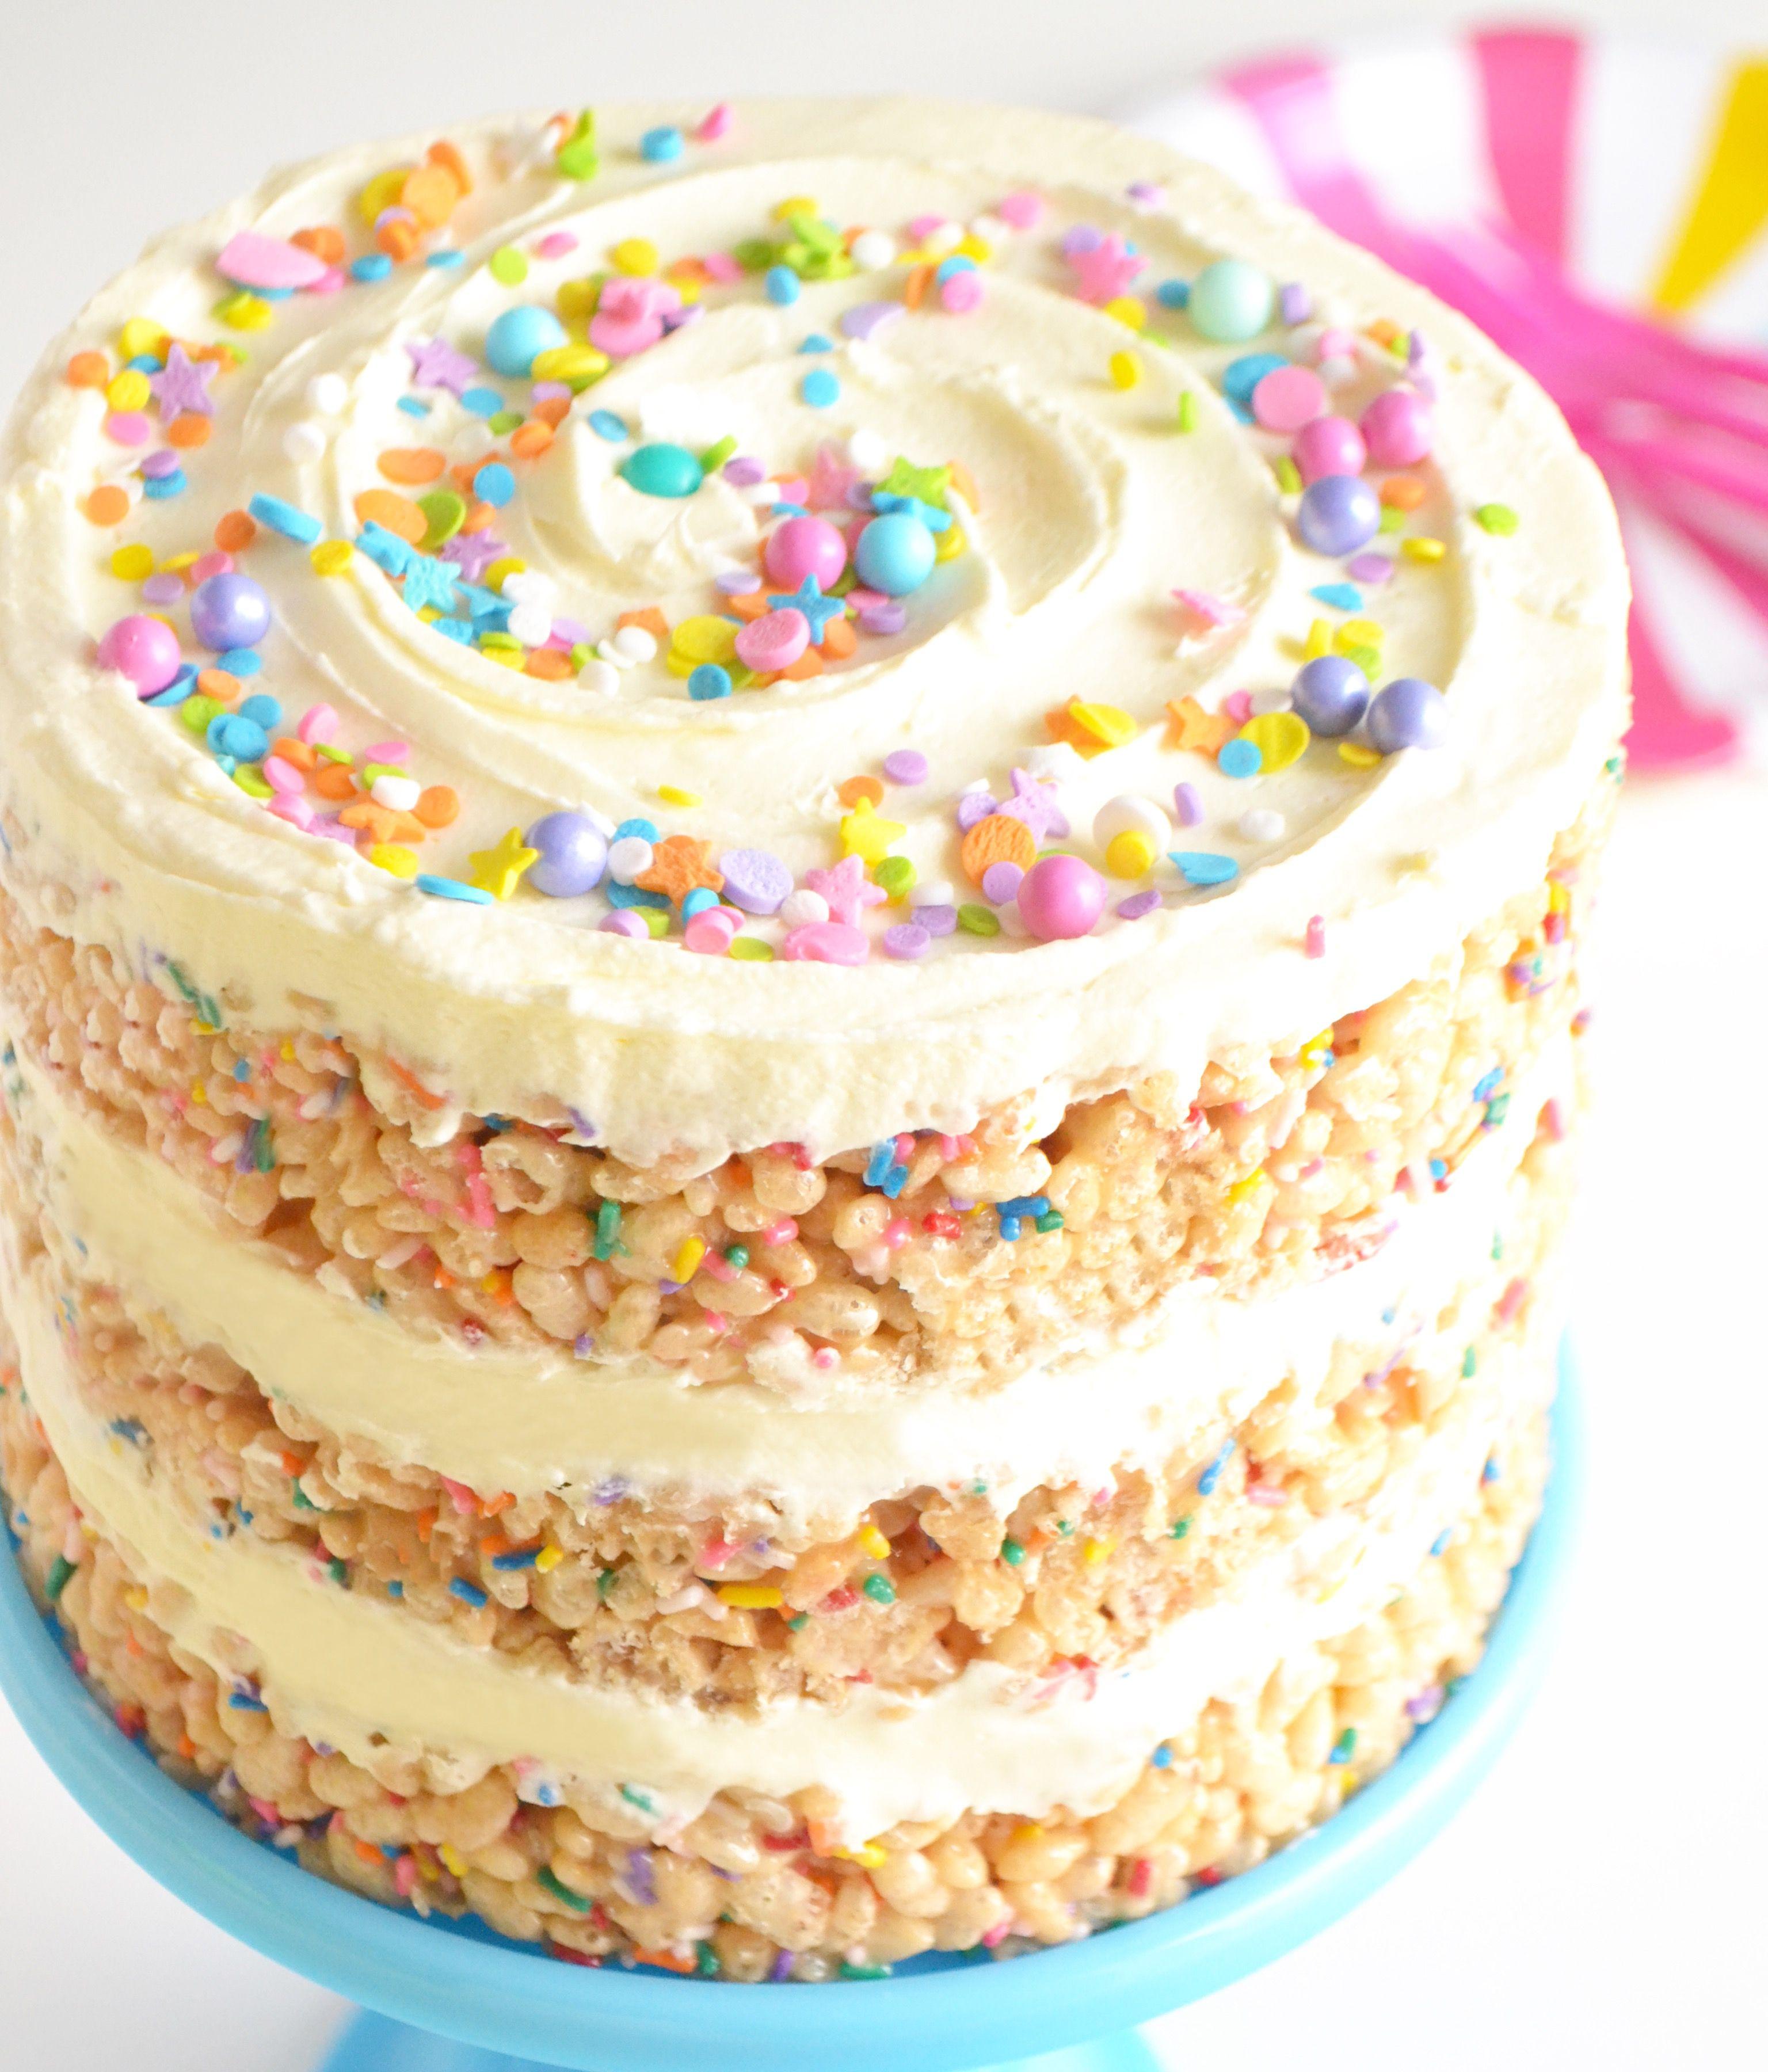 Cake Decorating Tutorials Cookie Rice Krispie Treats Krispies Fondant Tutorial